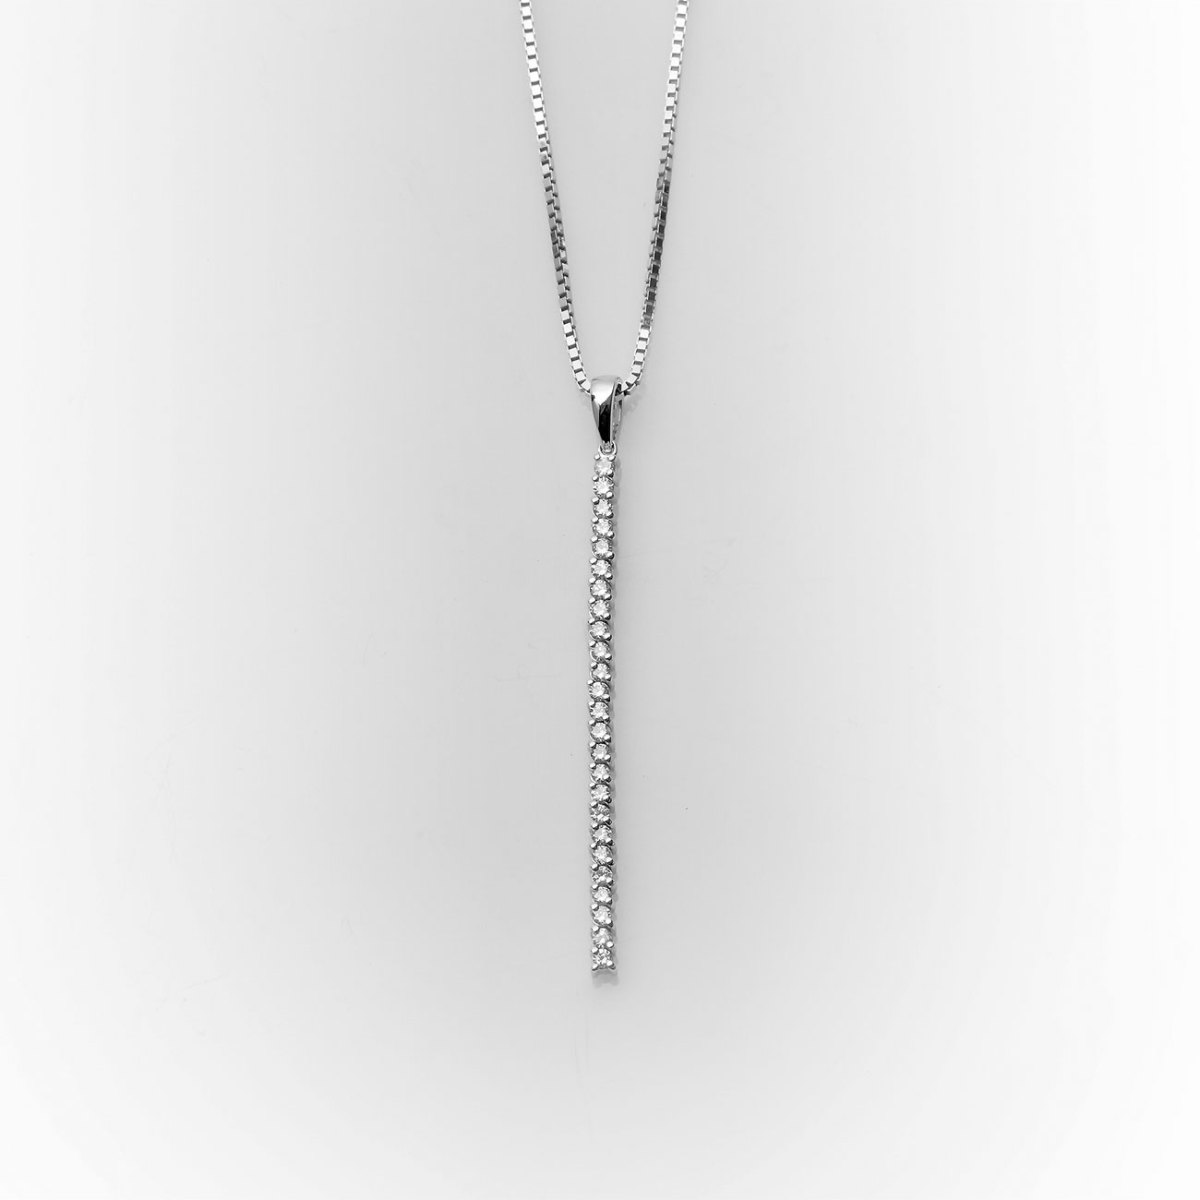 Line of diamonds pendant 0.50ct, chain, white gold 18K, Ref. PE+CH-B18962   EVENOR Jewelry • Brand new and vintage jewelry